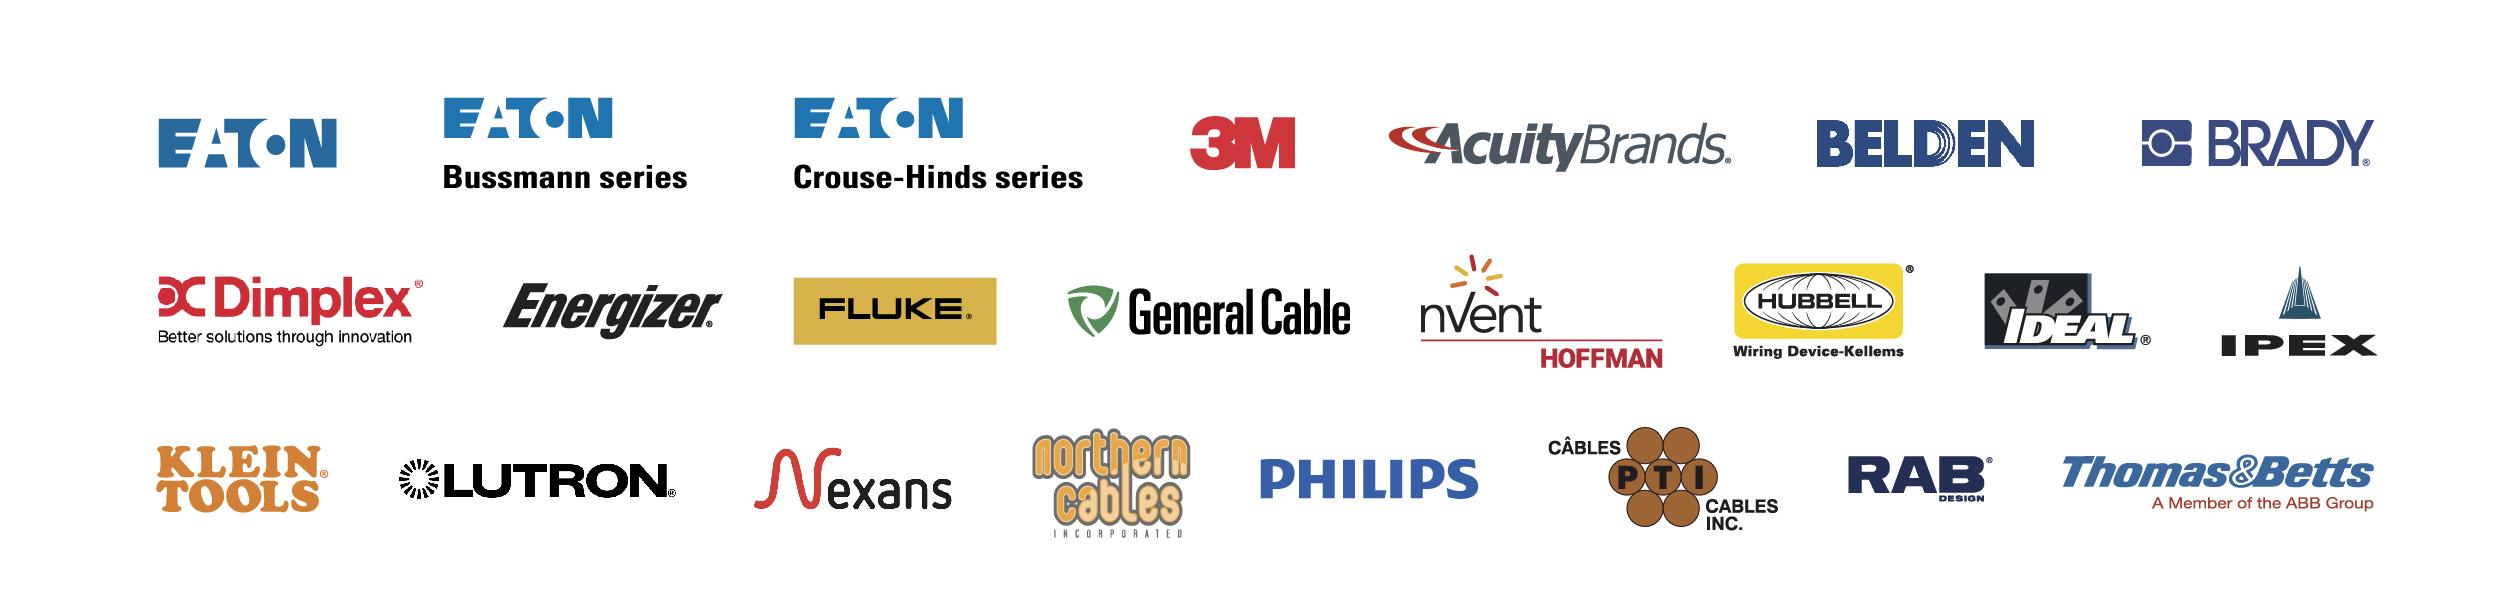 Logos Midwest.jpg